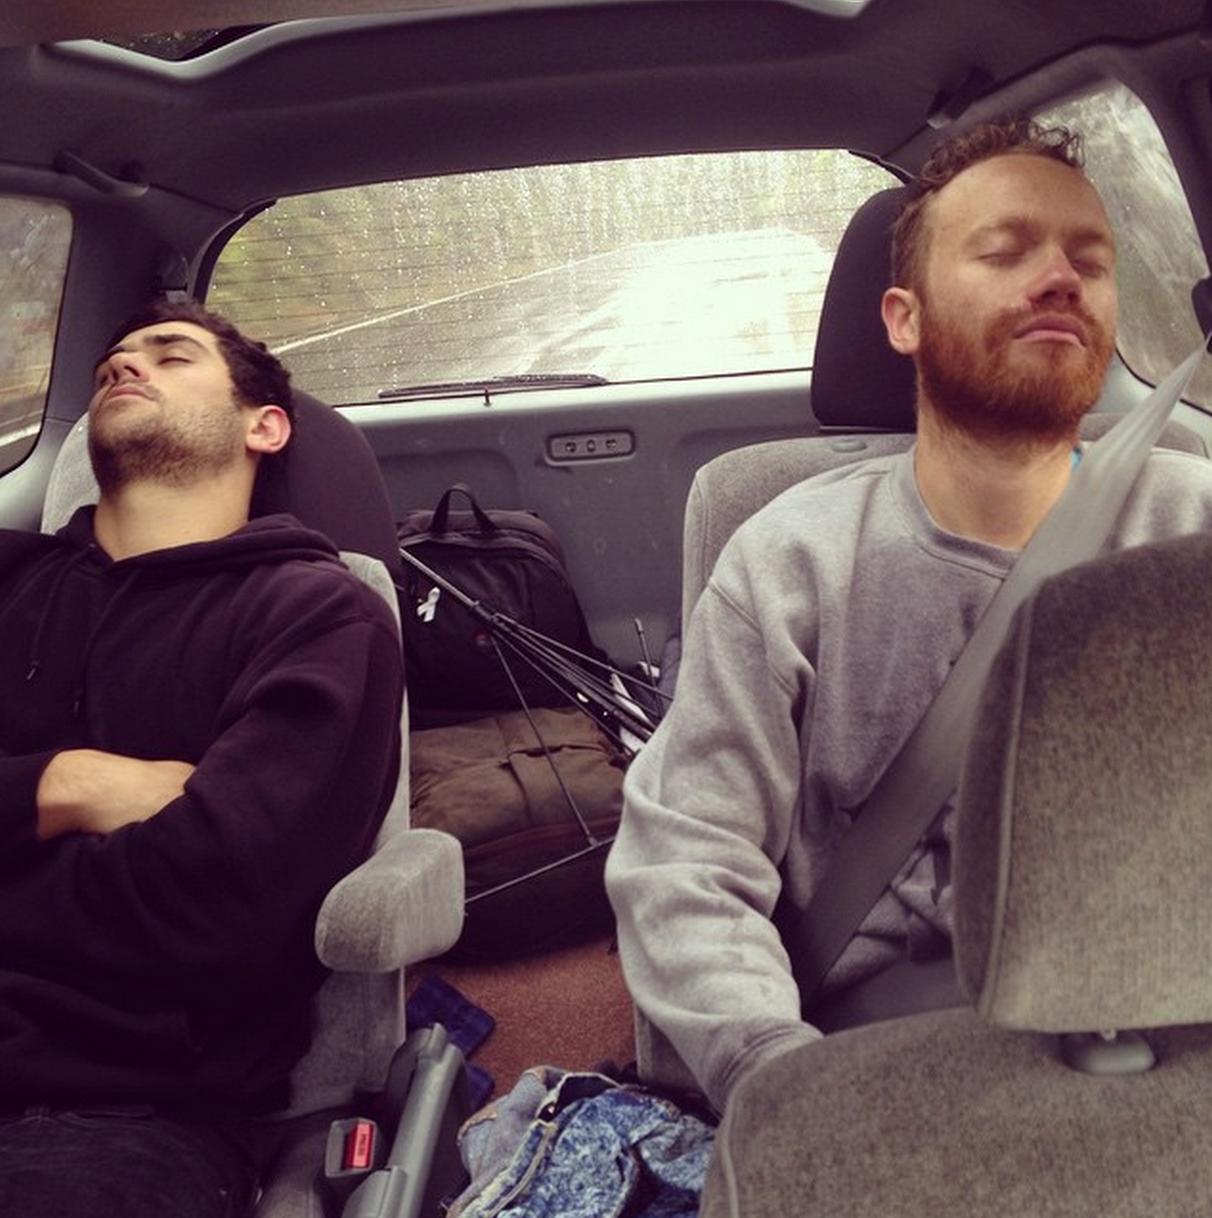 Sleeping beauties RISKY & Mara TK on the car ride back. Heroes.